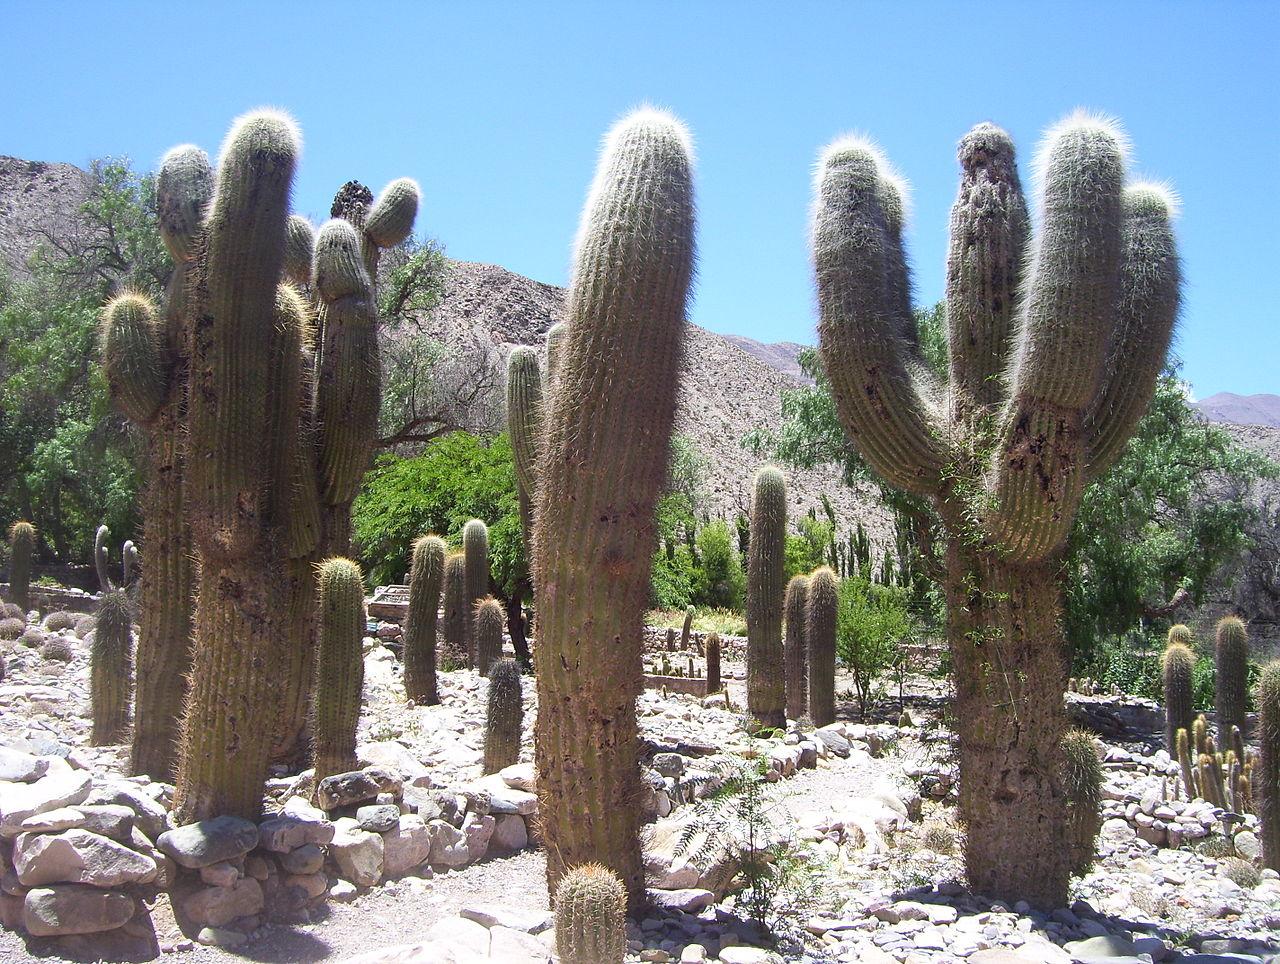 Evasaco Jardin_Botanico_de_Altura-Tilcara-Jujuy